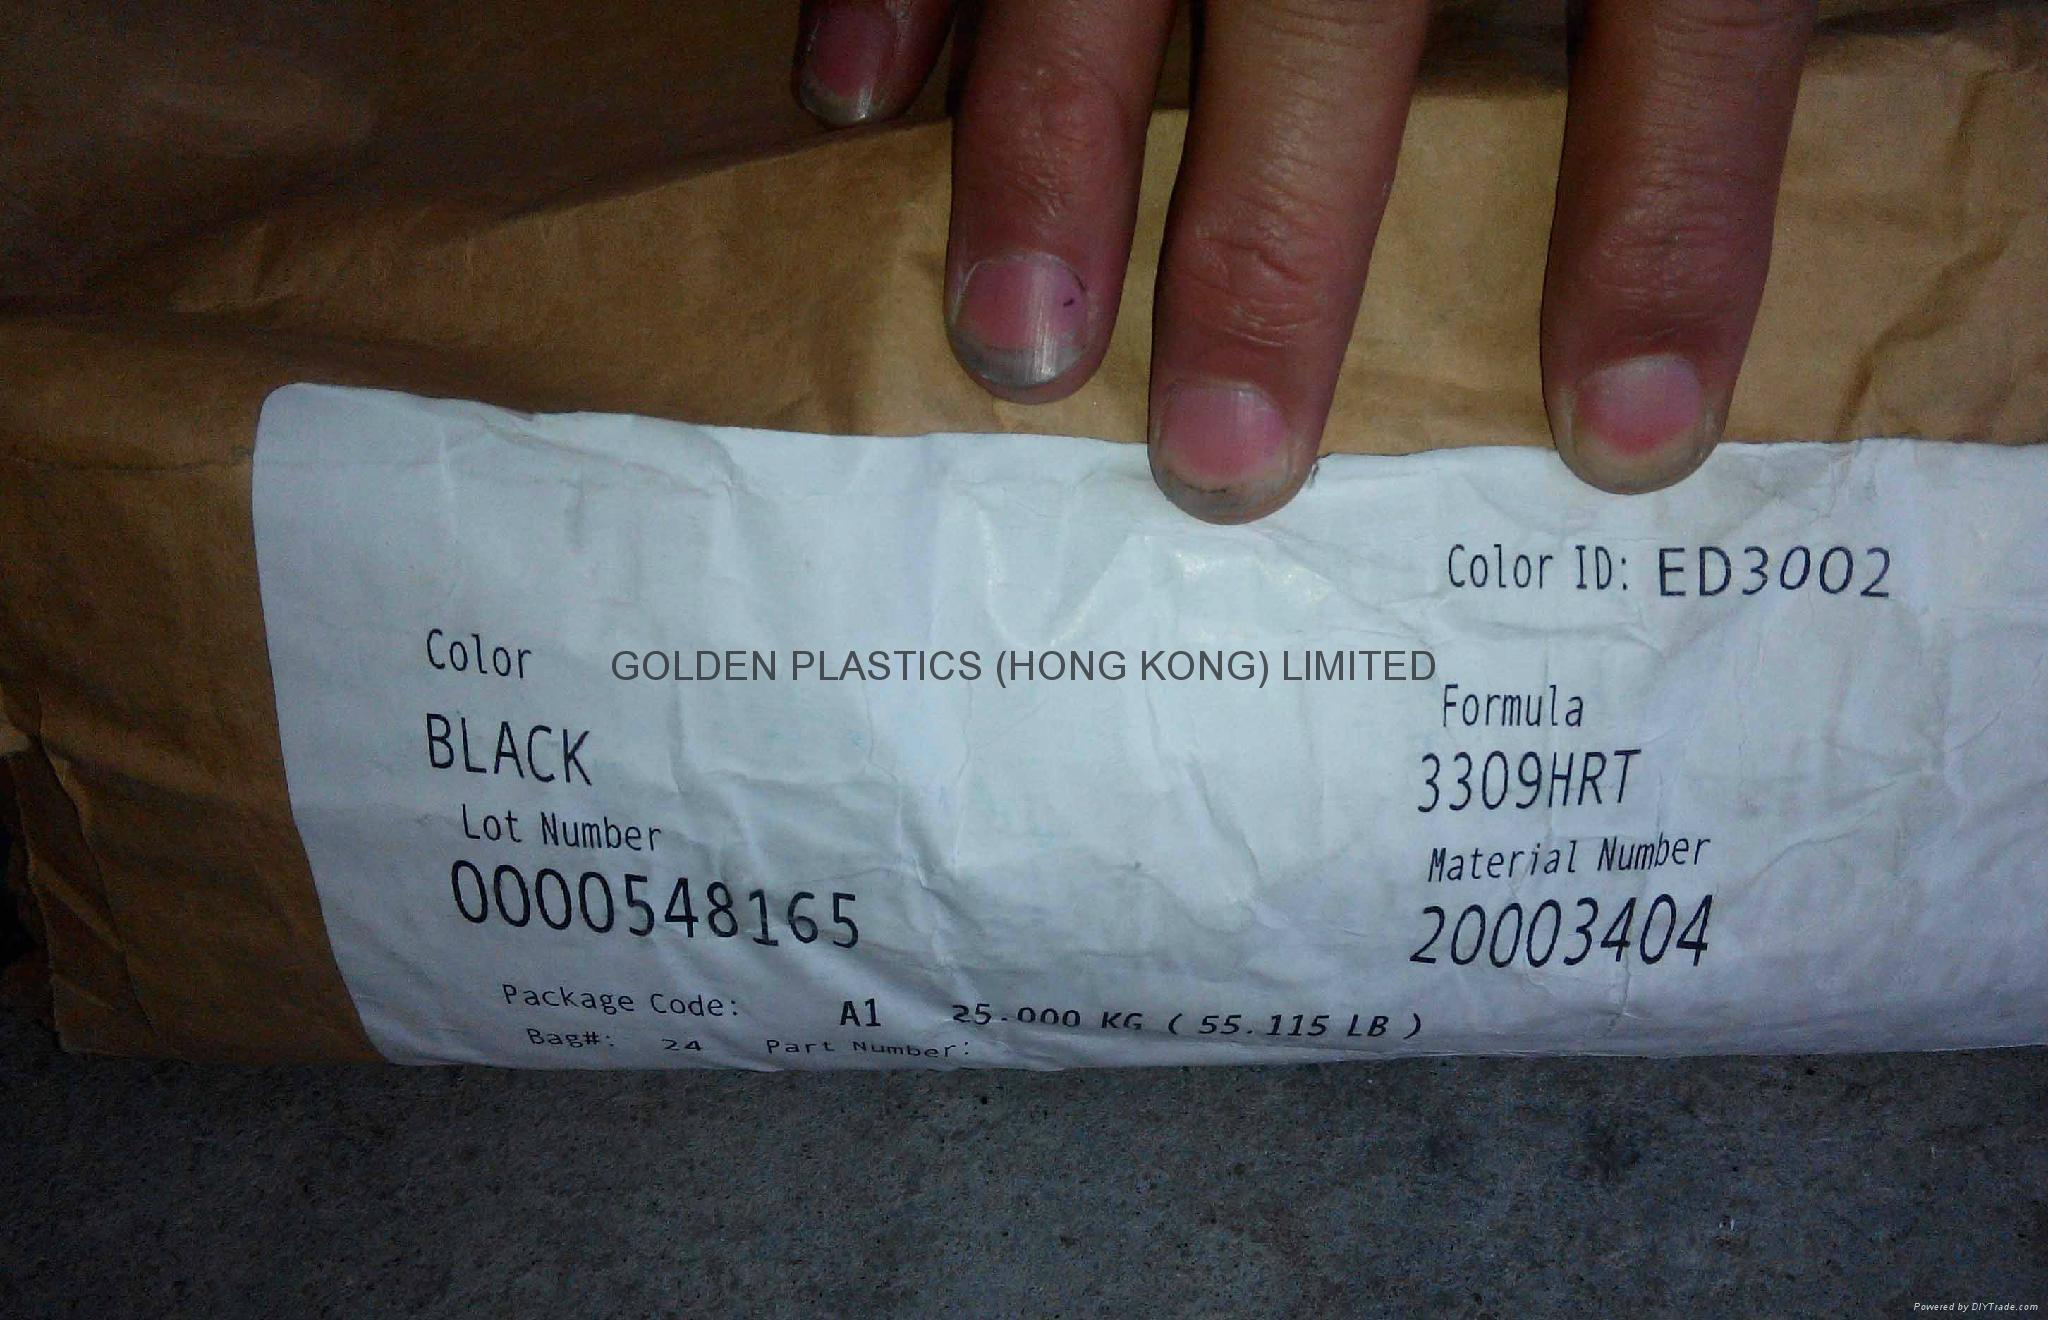 Celanex 3309HRT